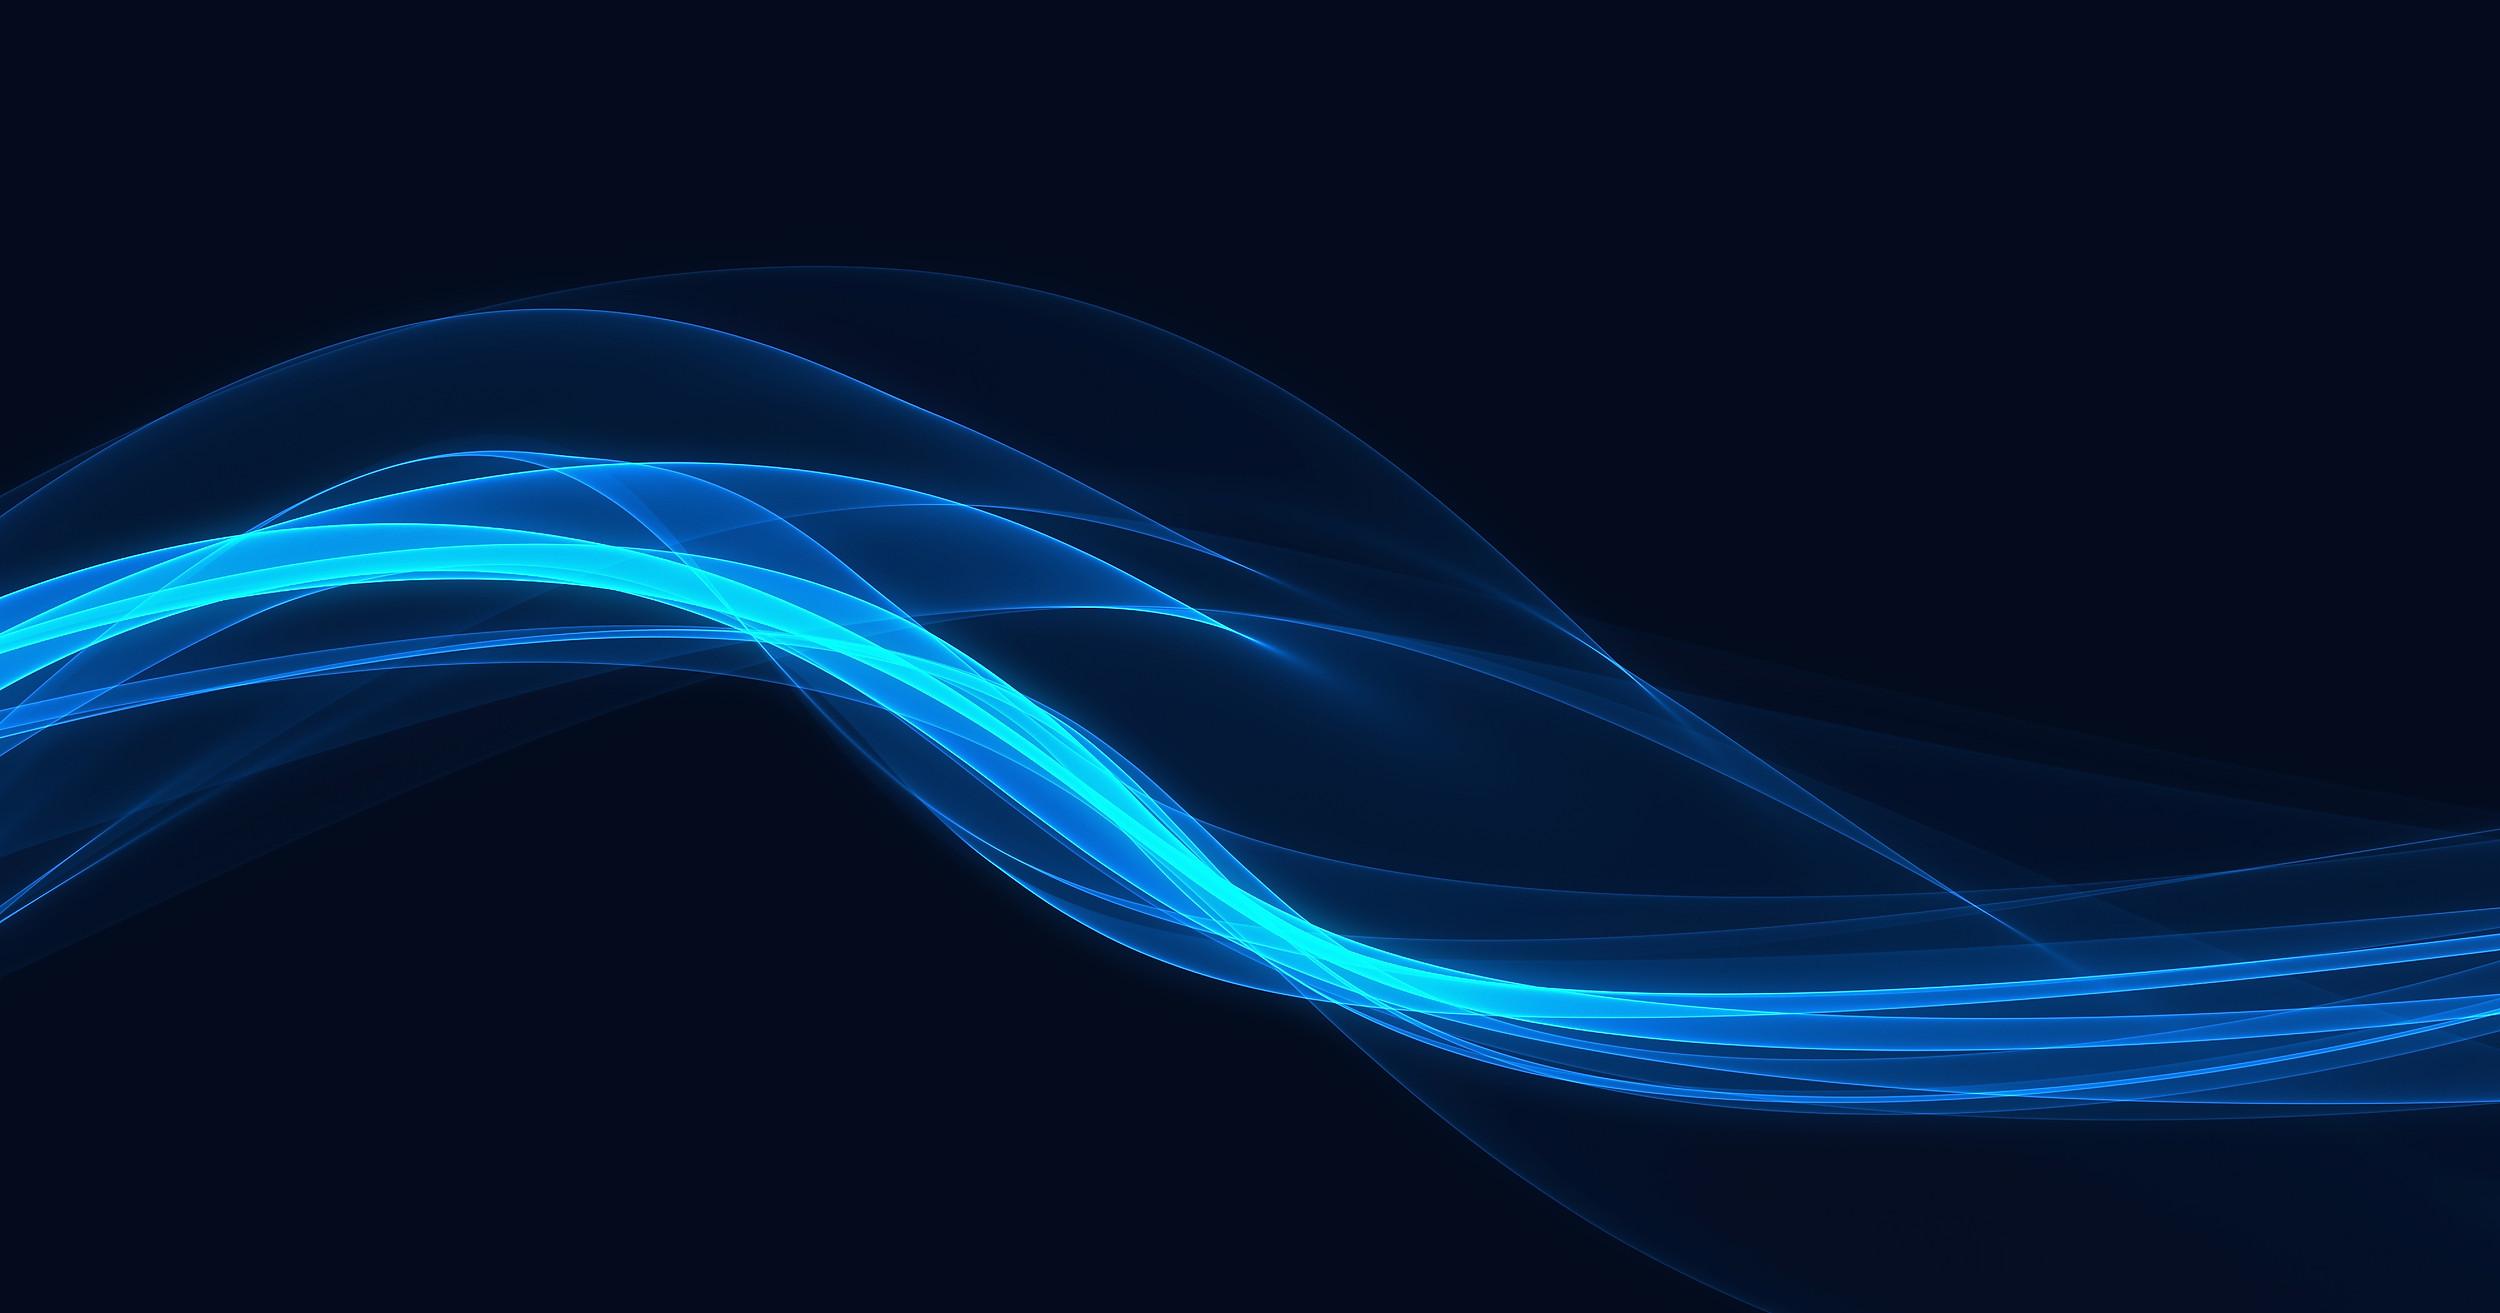 abstract-smooth-blue-light-streak-wave-b